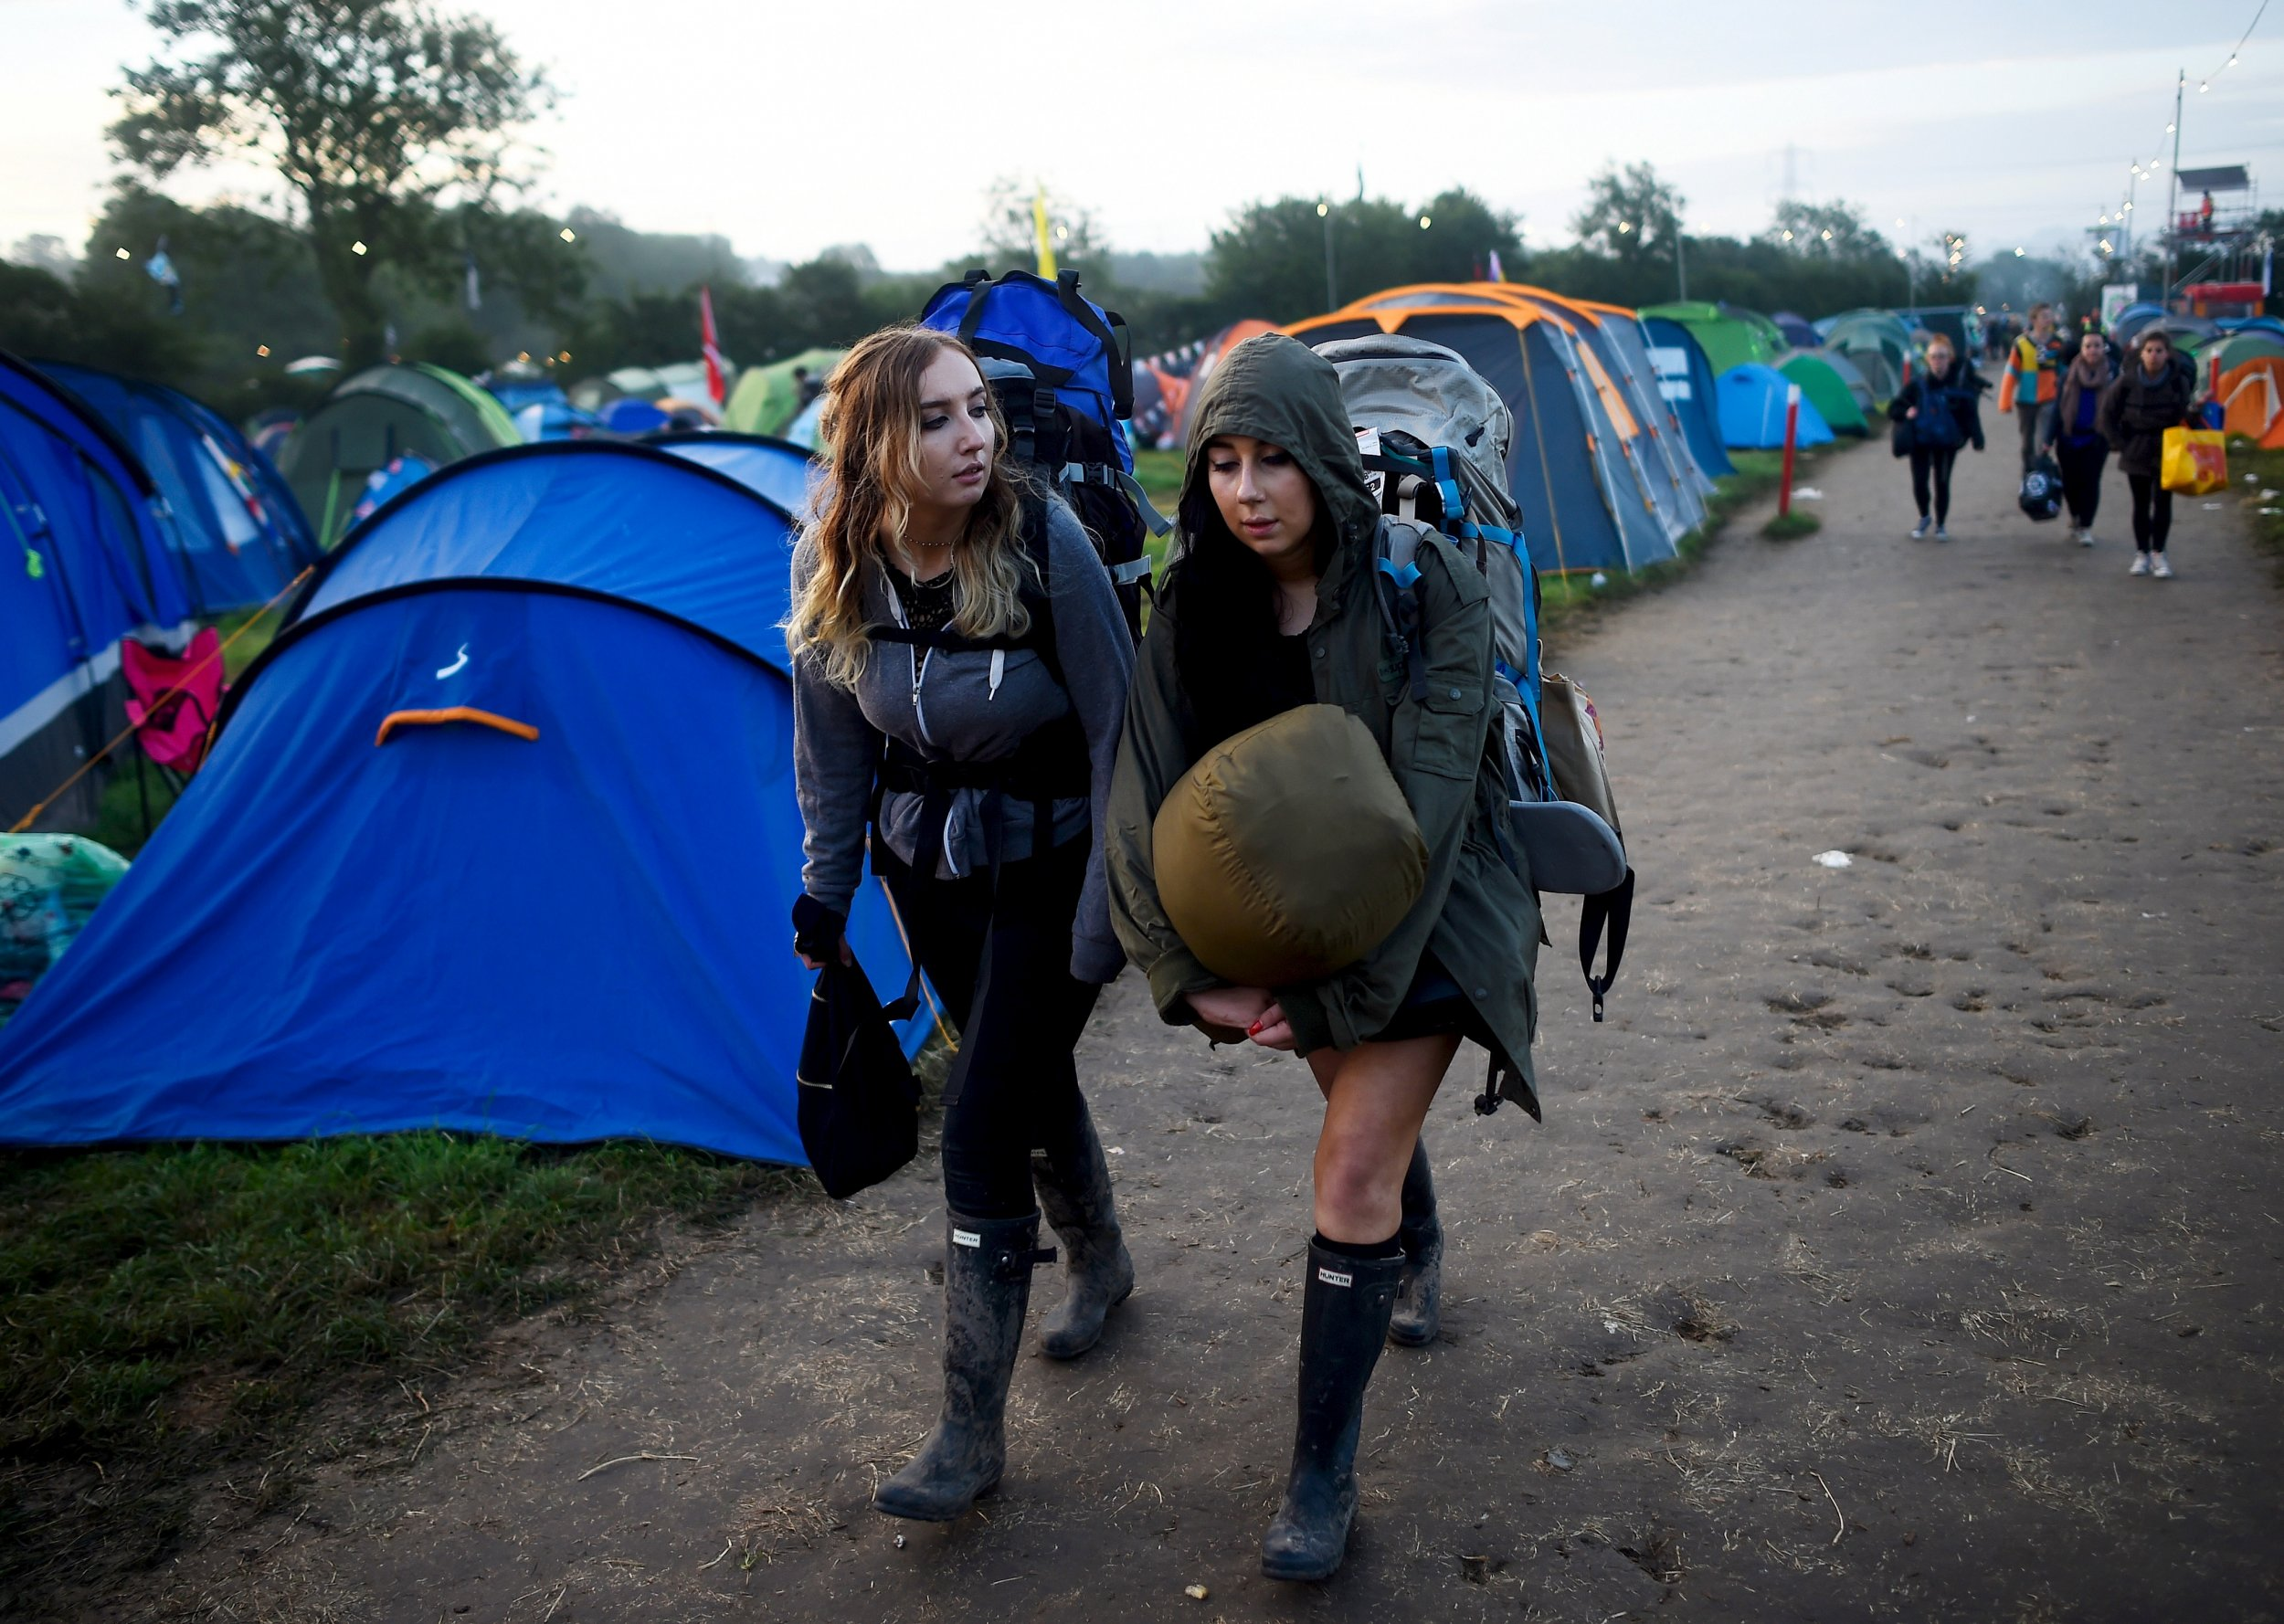 Glastonbury festivalgoers